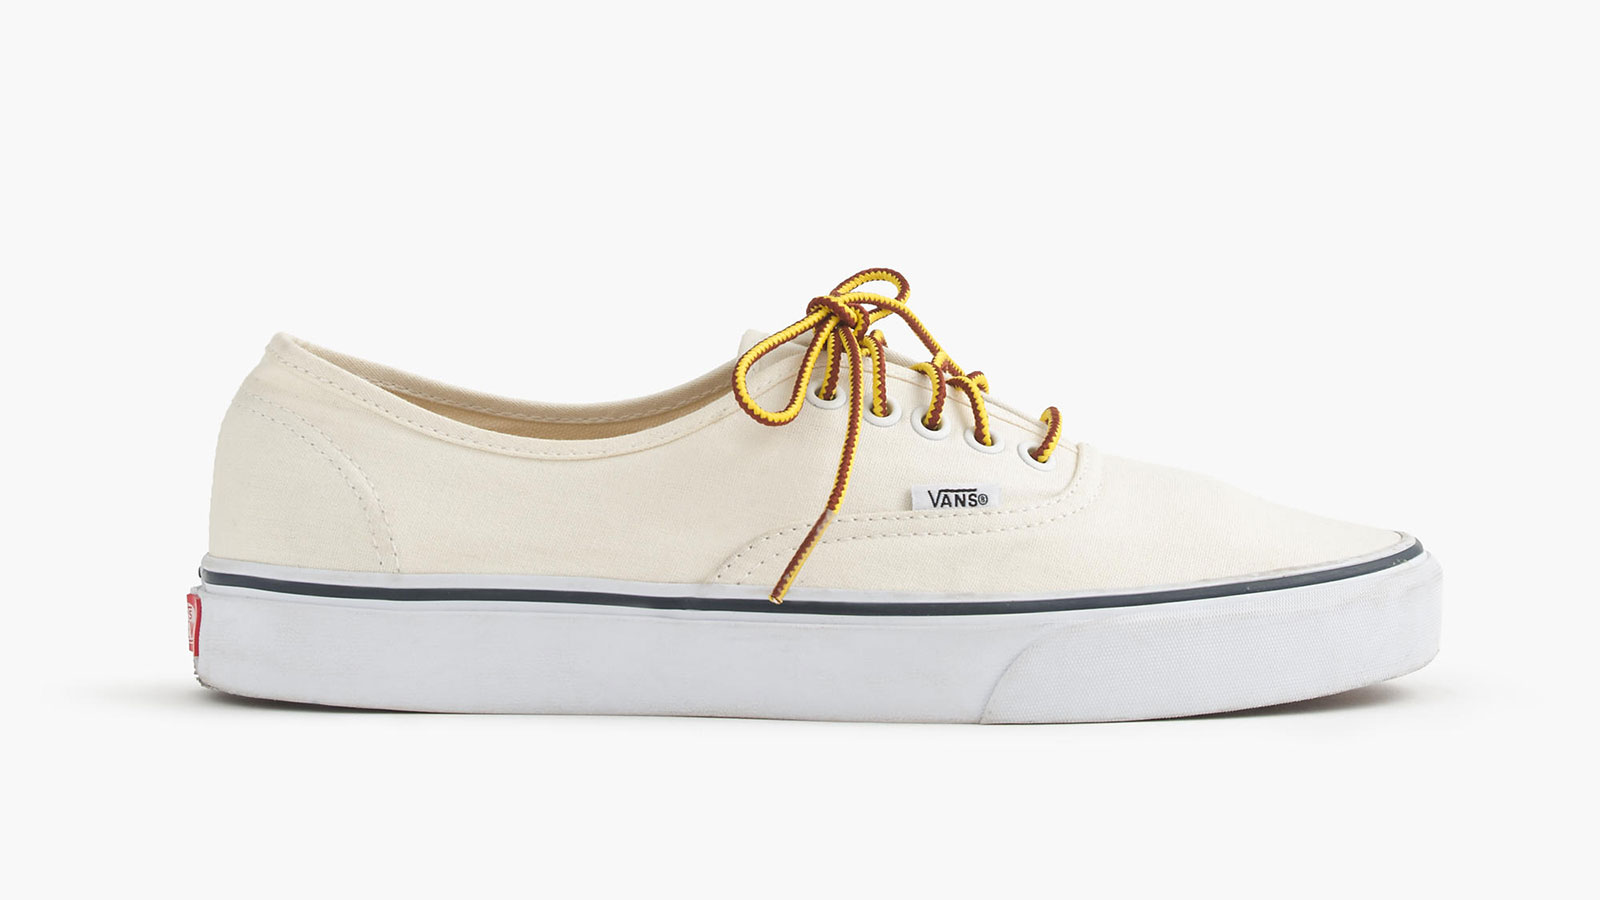 Vans for J. Crew Canvas Authentic White Men's Sneakers | best men's white sneakers